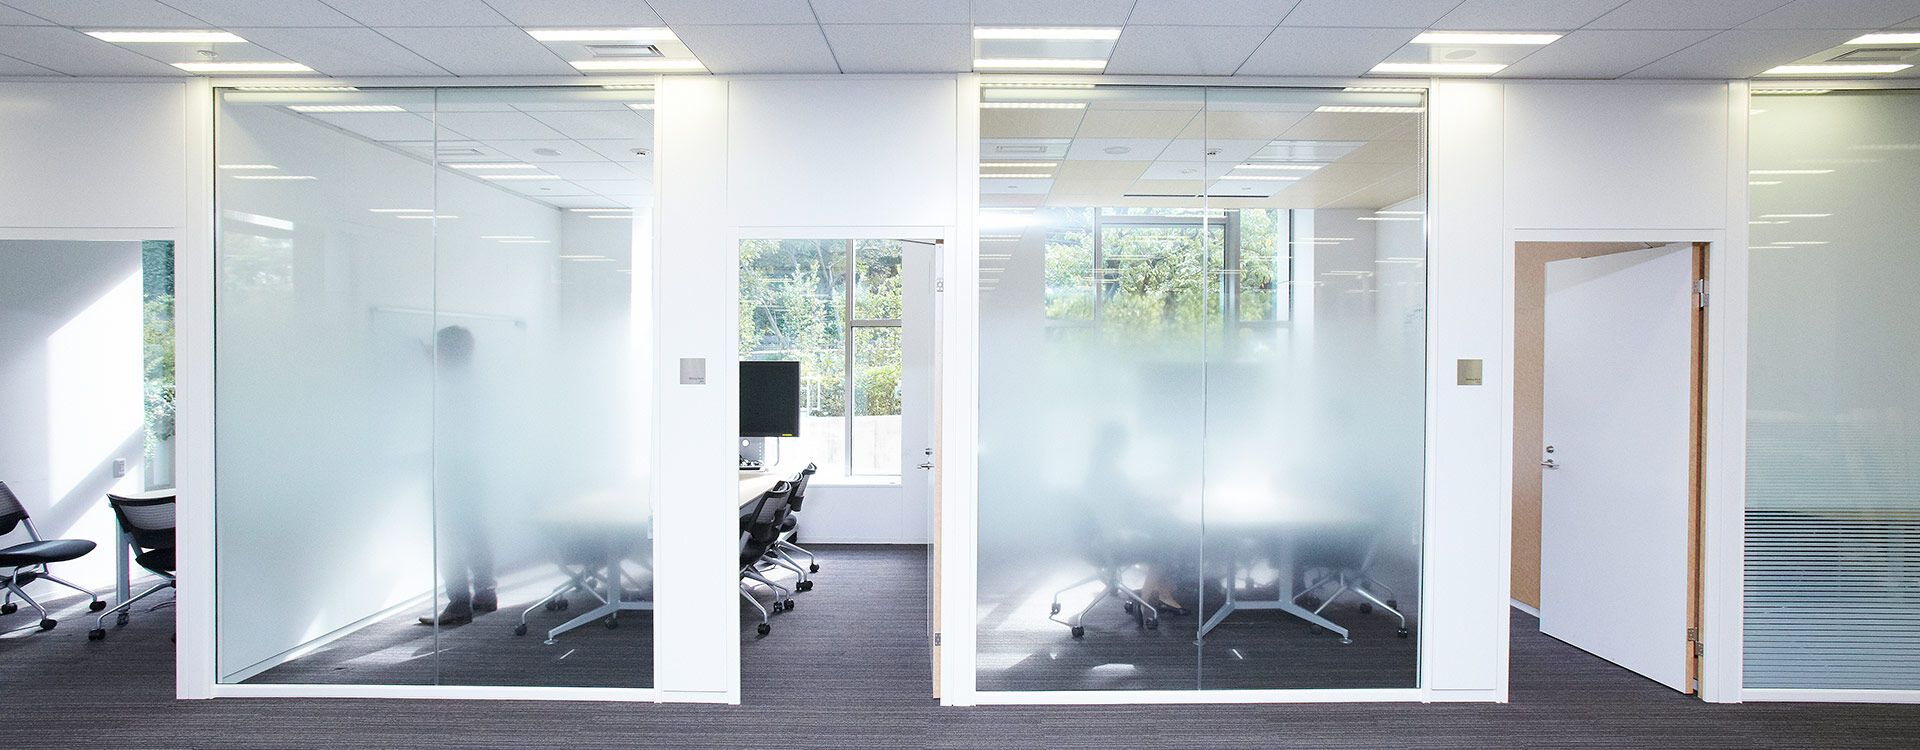 6 strips of DDA dots frosted glass manifestation safety film